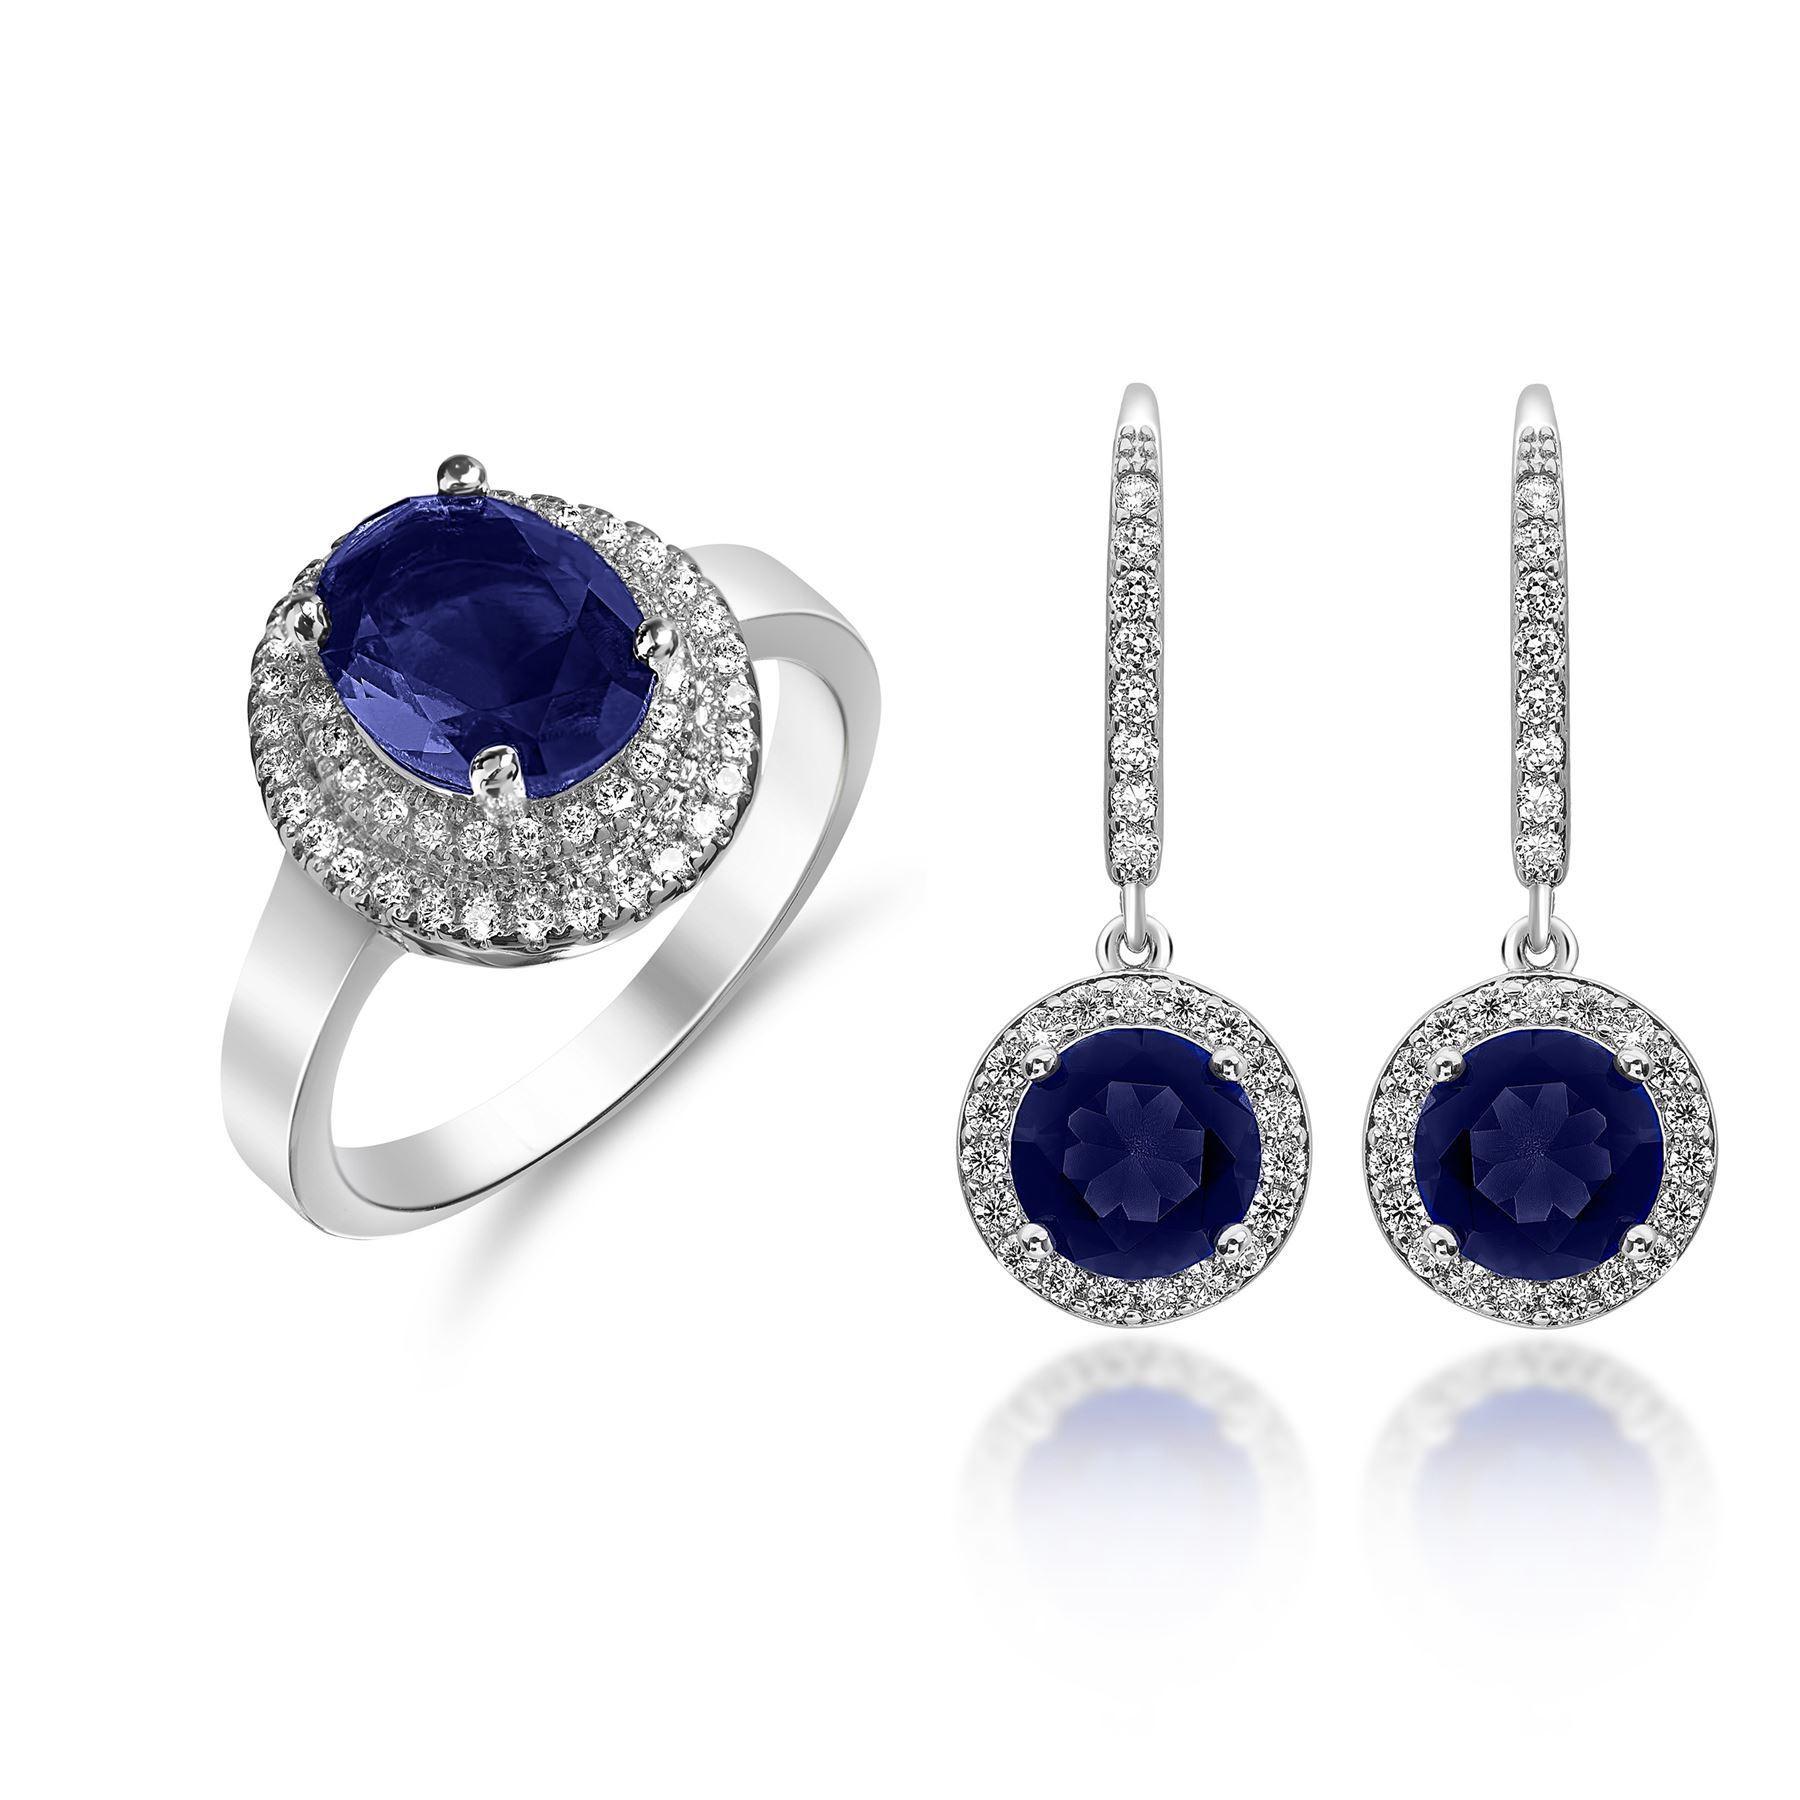 Royal Blue Earrings  Royal Blue Crystal Ring & Drop Earrings Set